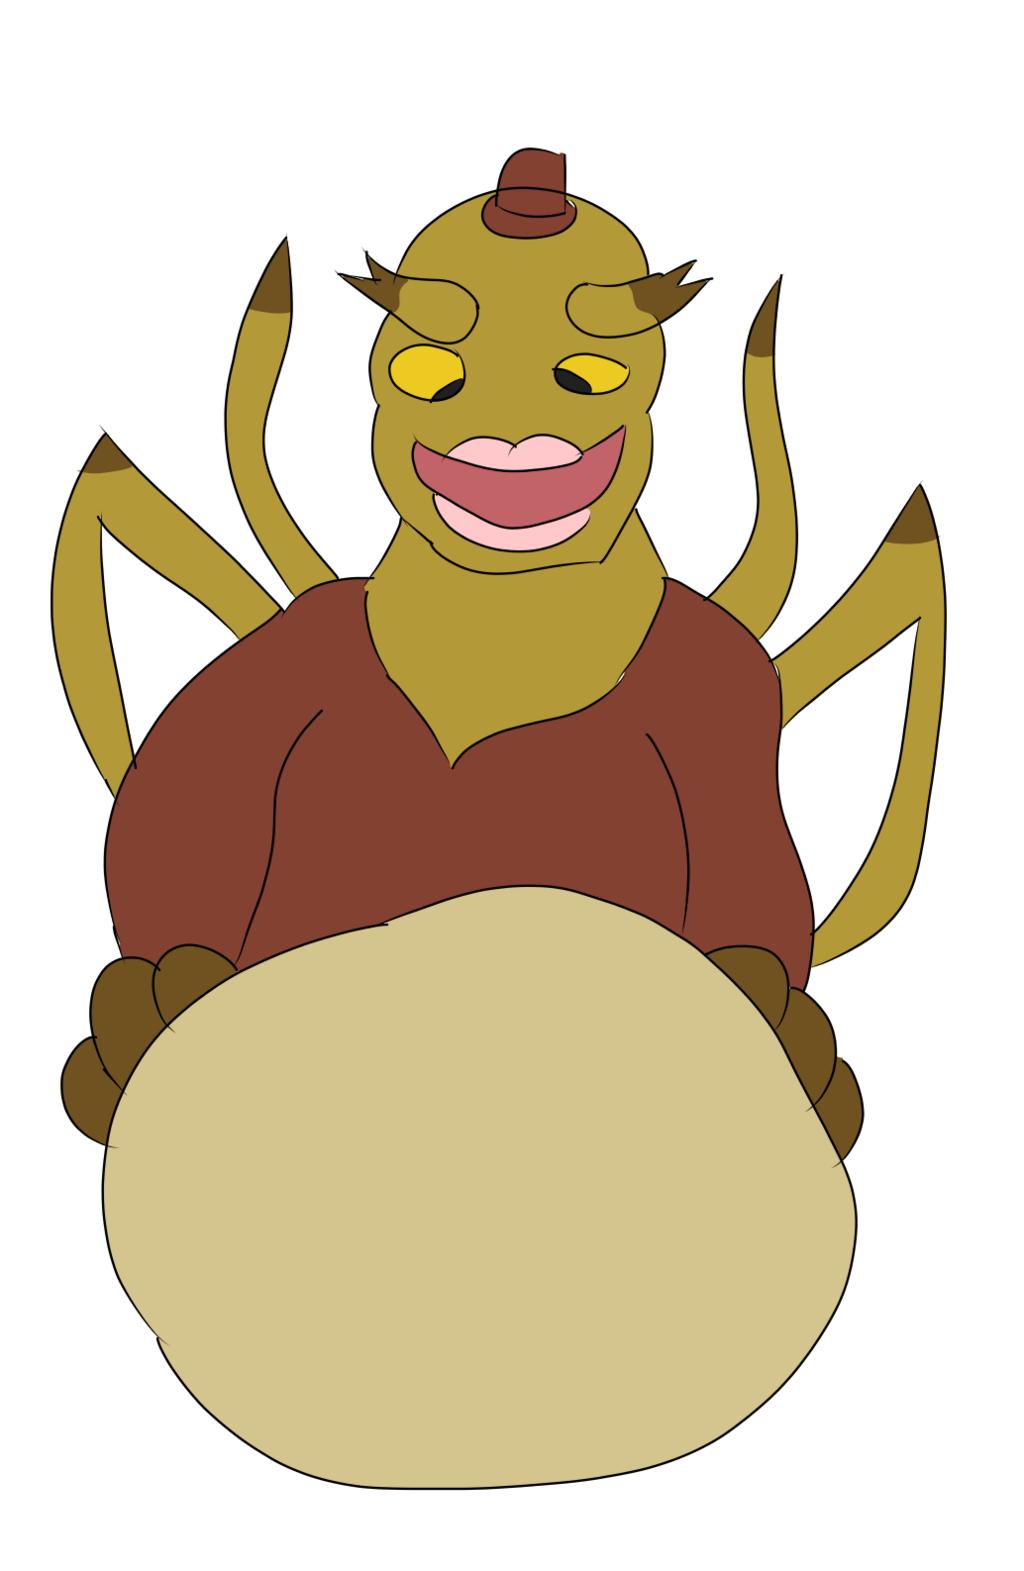 A Veenox 7 alien's big belly, doodled